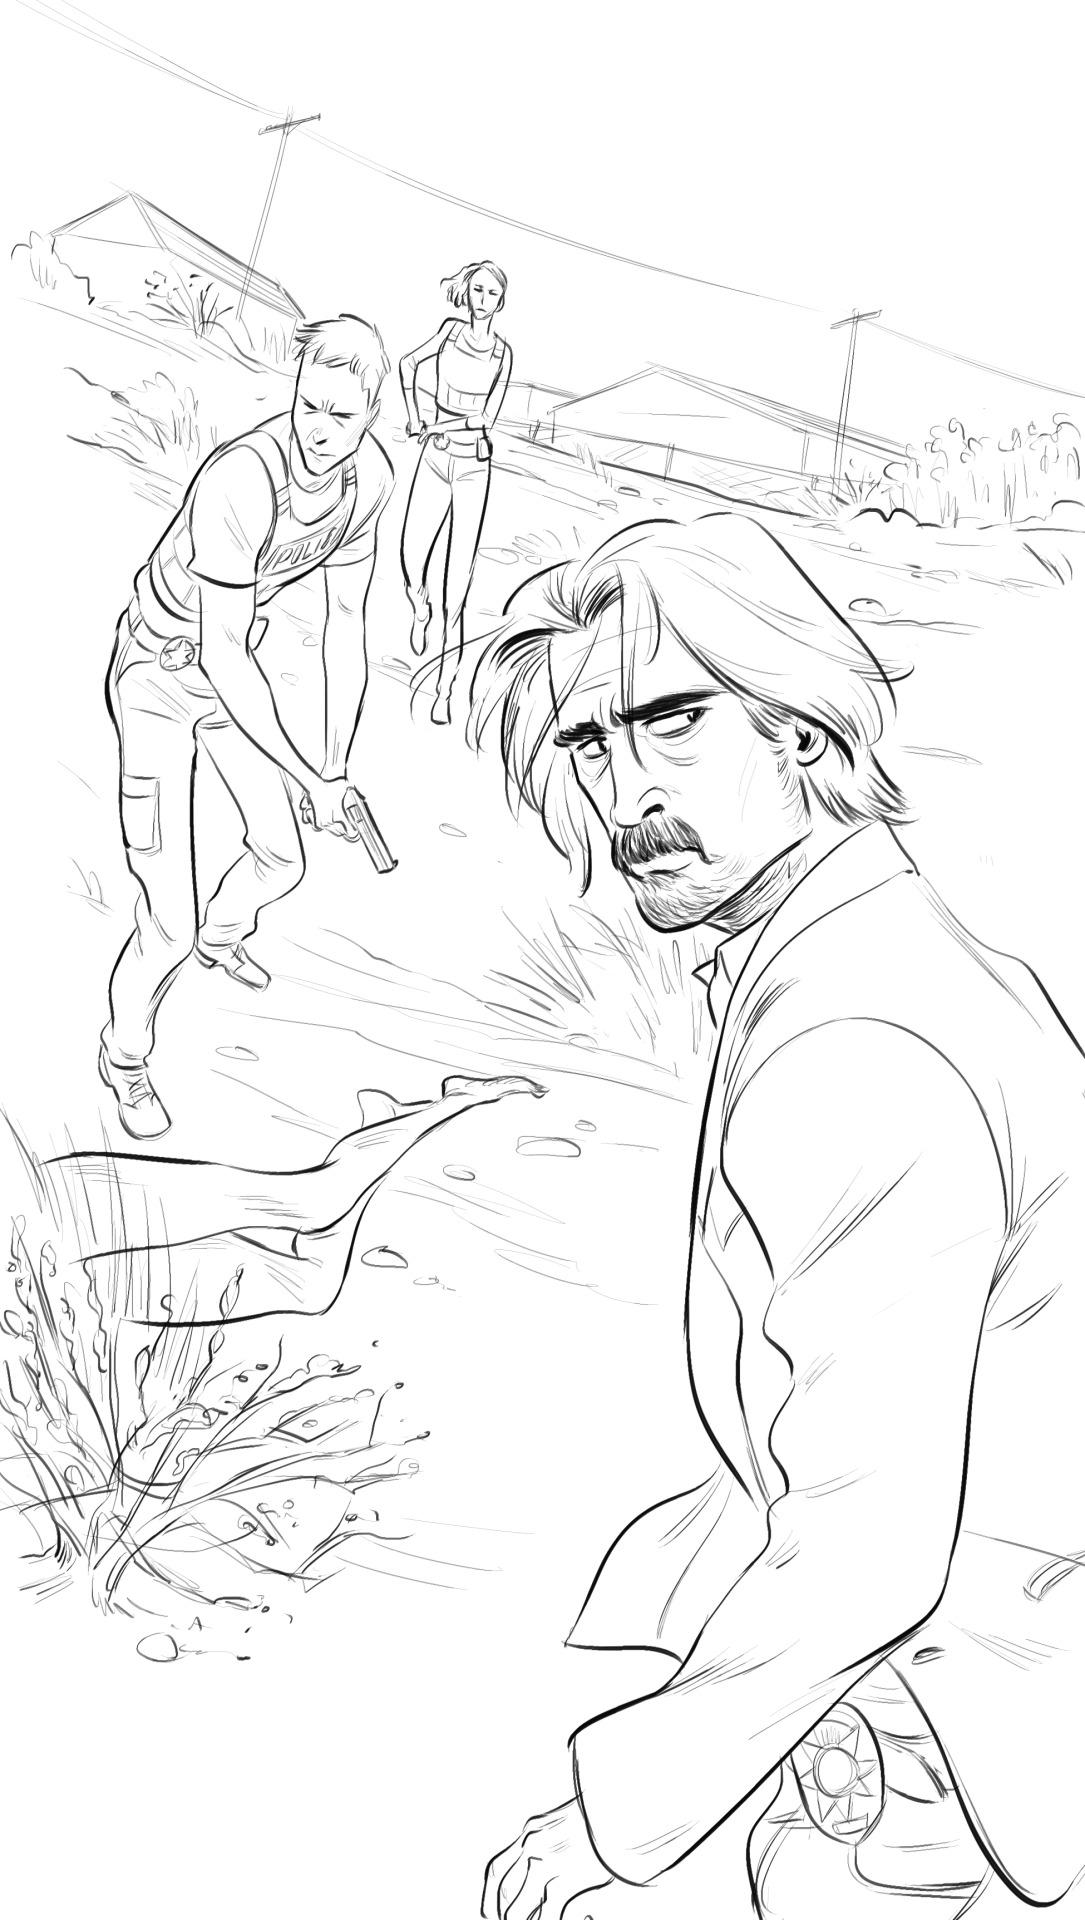 True Detective Season 2 Washington Post Illustrations by Kenny Park